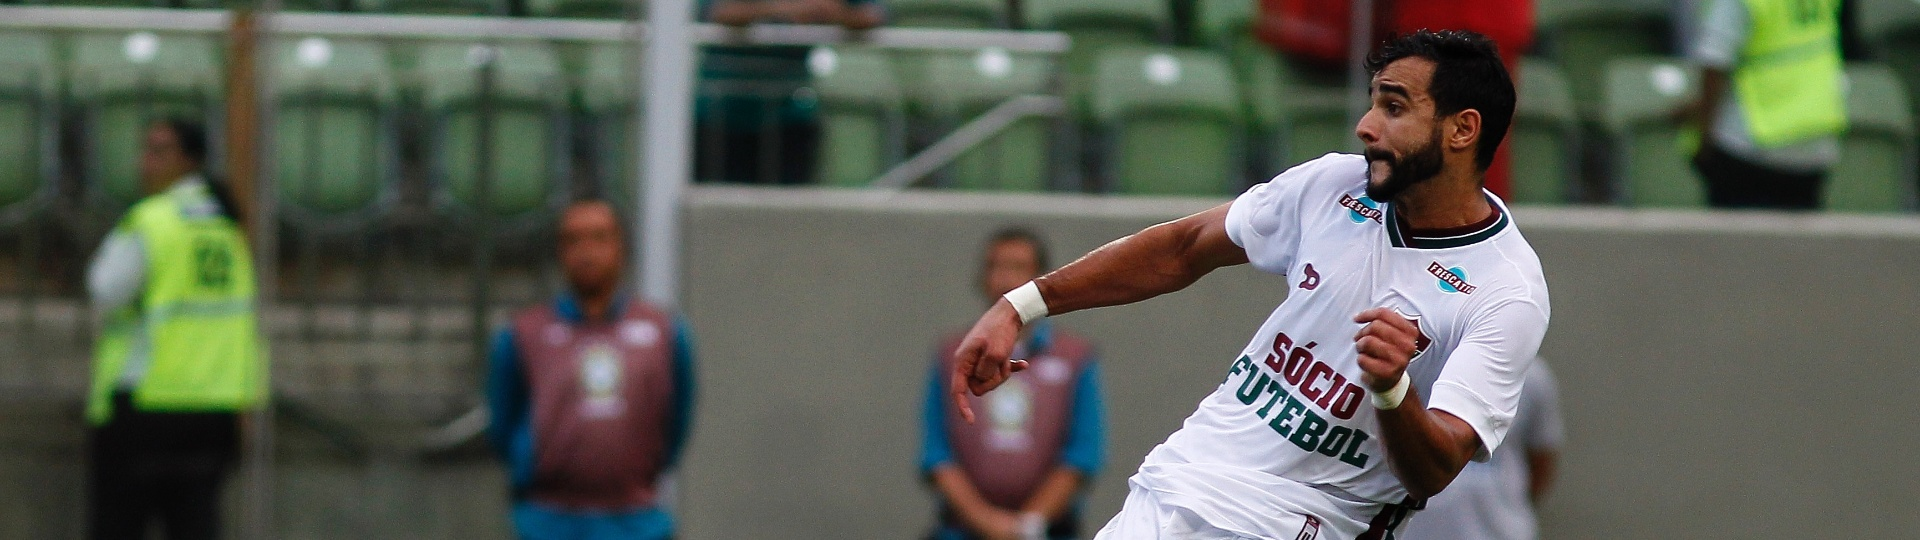 Henrique Dourado abriu o placar para o Fluminense contra o Atlético-MG